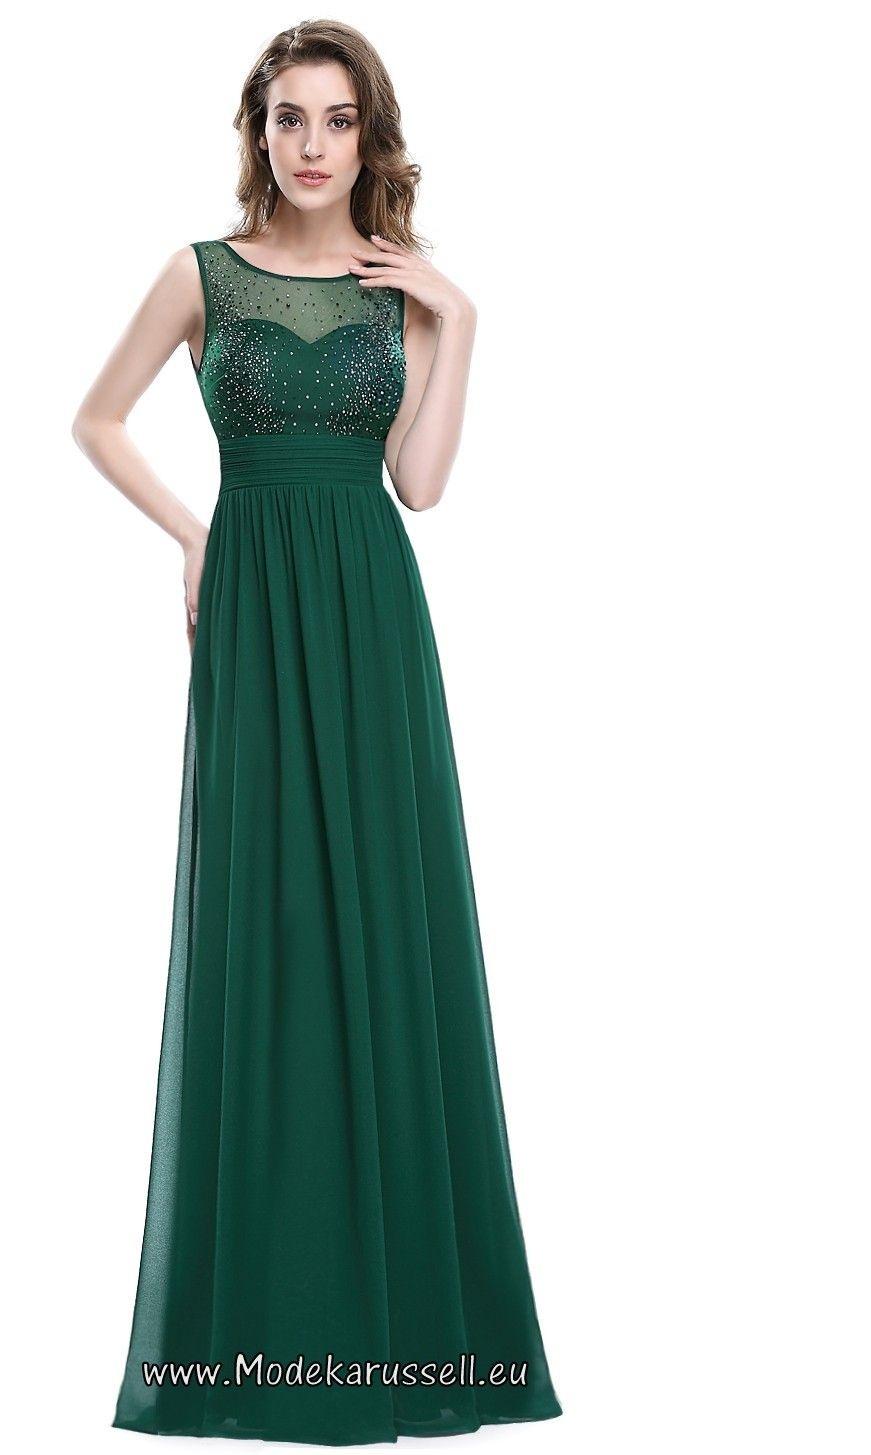 Formal Luxus Abendkleid Lang Grün Ärmel - Abendkleid